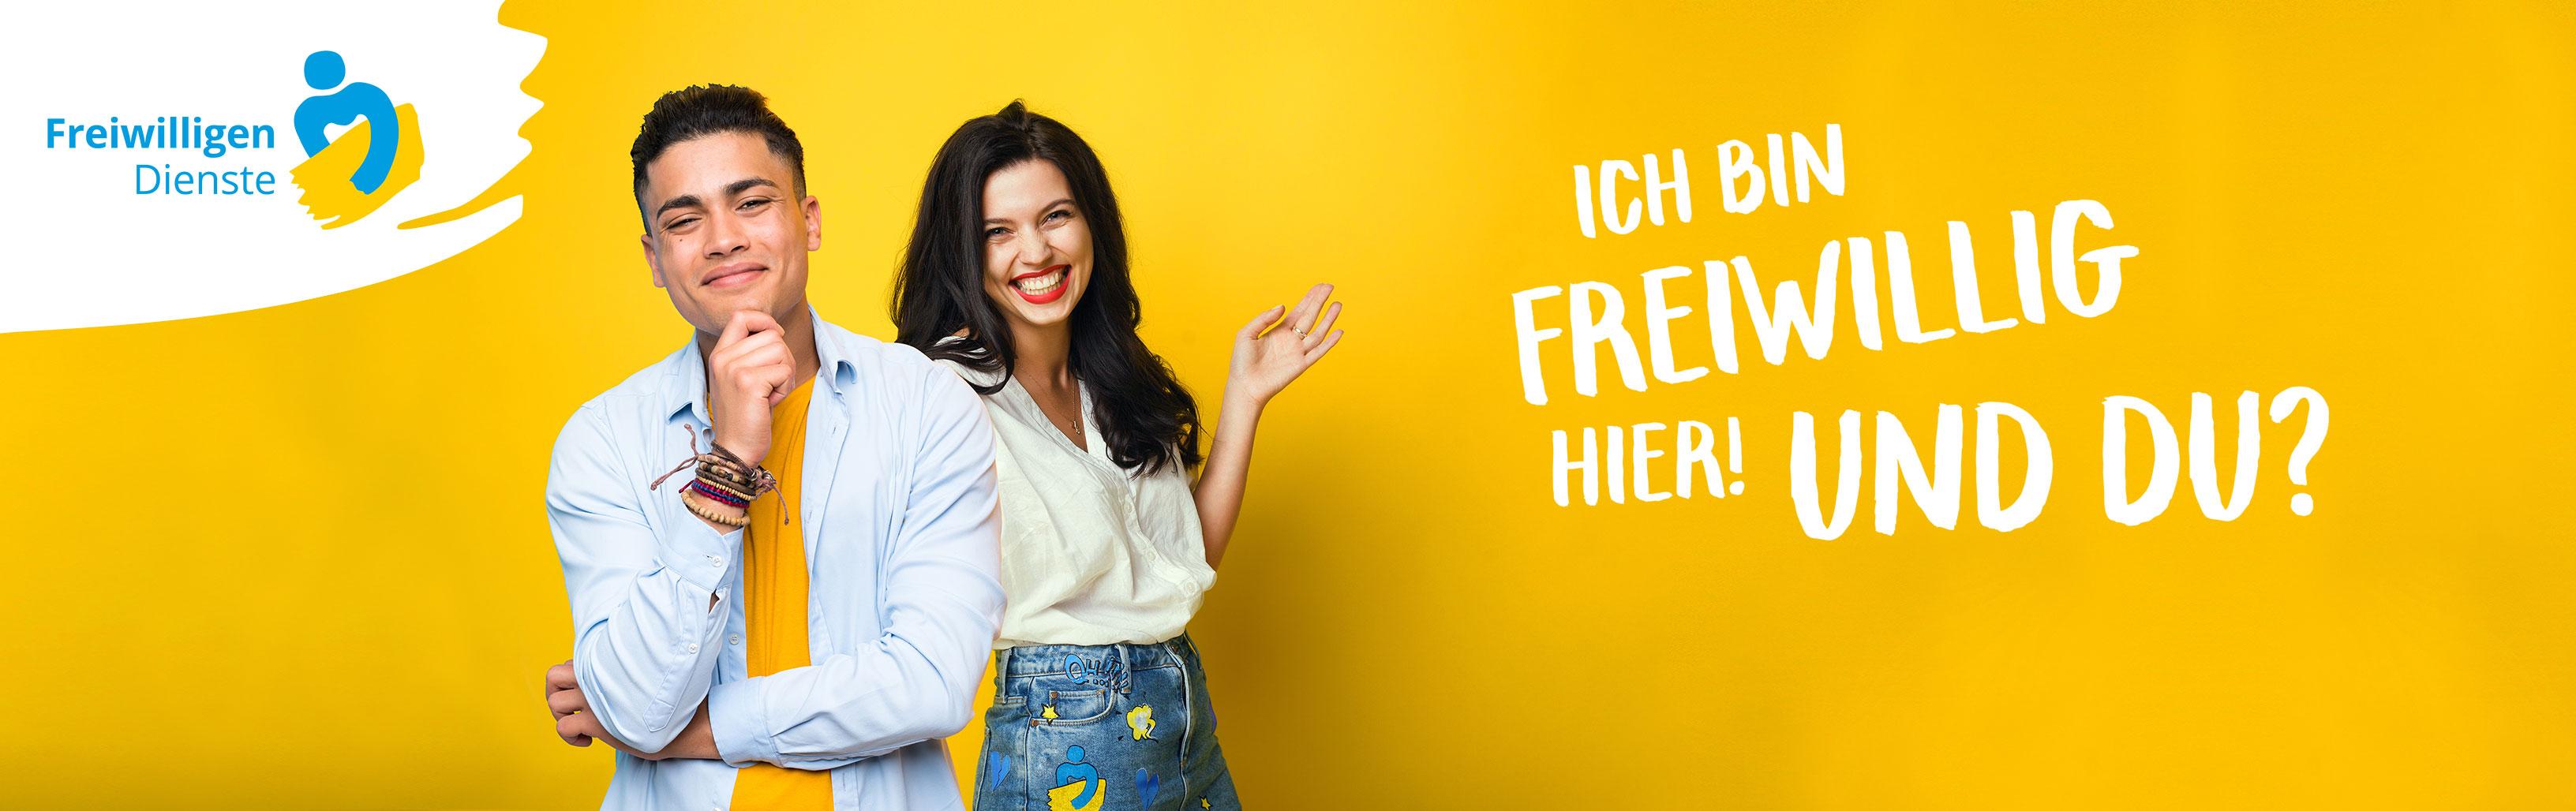 upload/IB-Mitte_NEU2017/Naumburg/Projekte/Freiwilligendienste/Bilder/Header_Freiwilligendienste_2.jpg